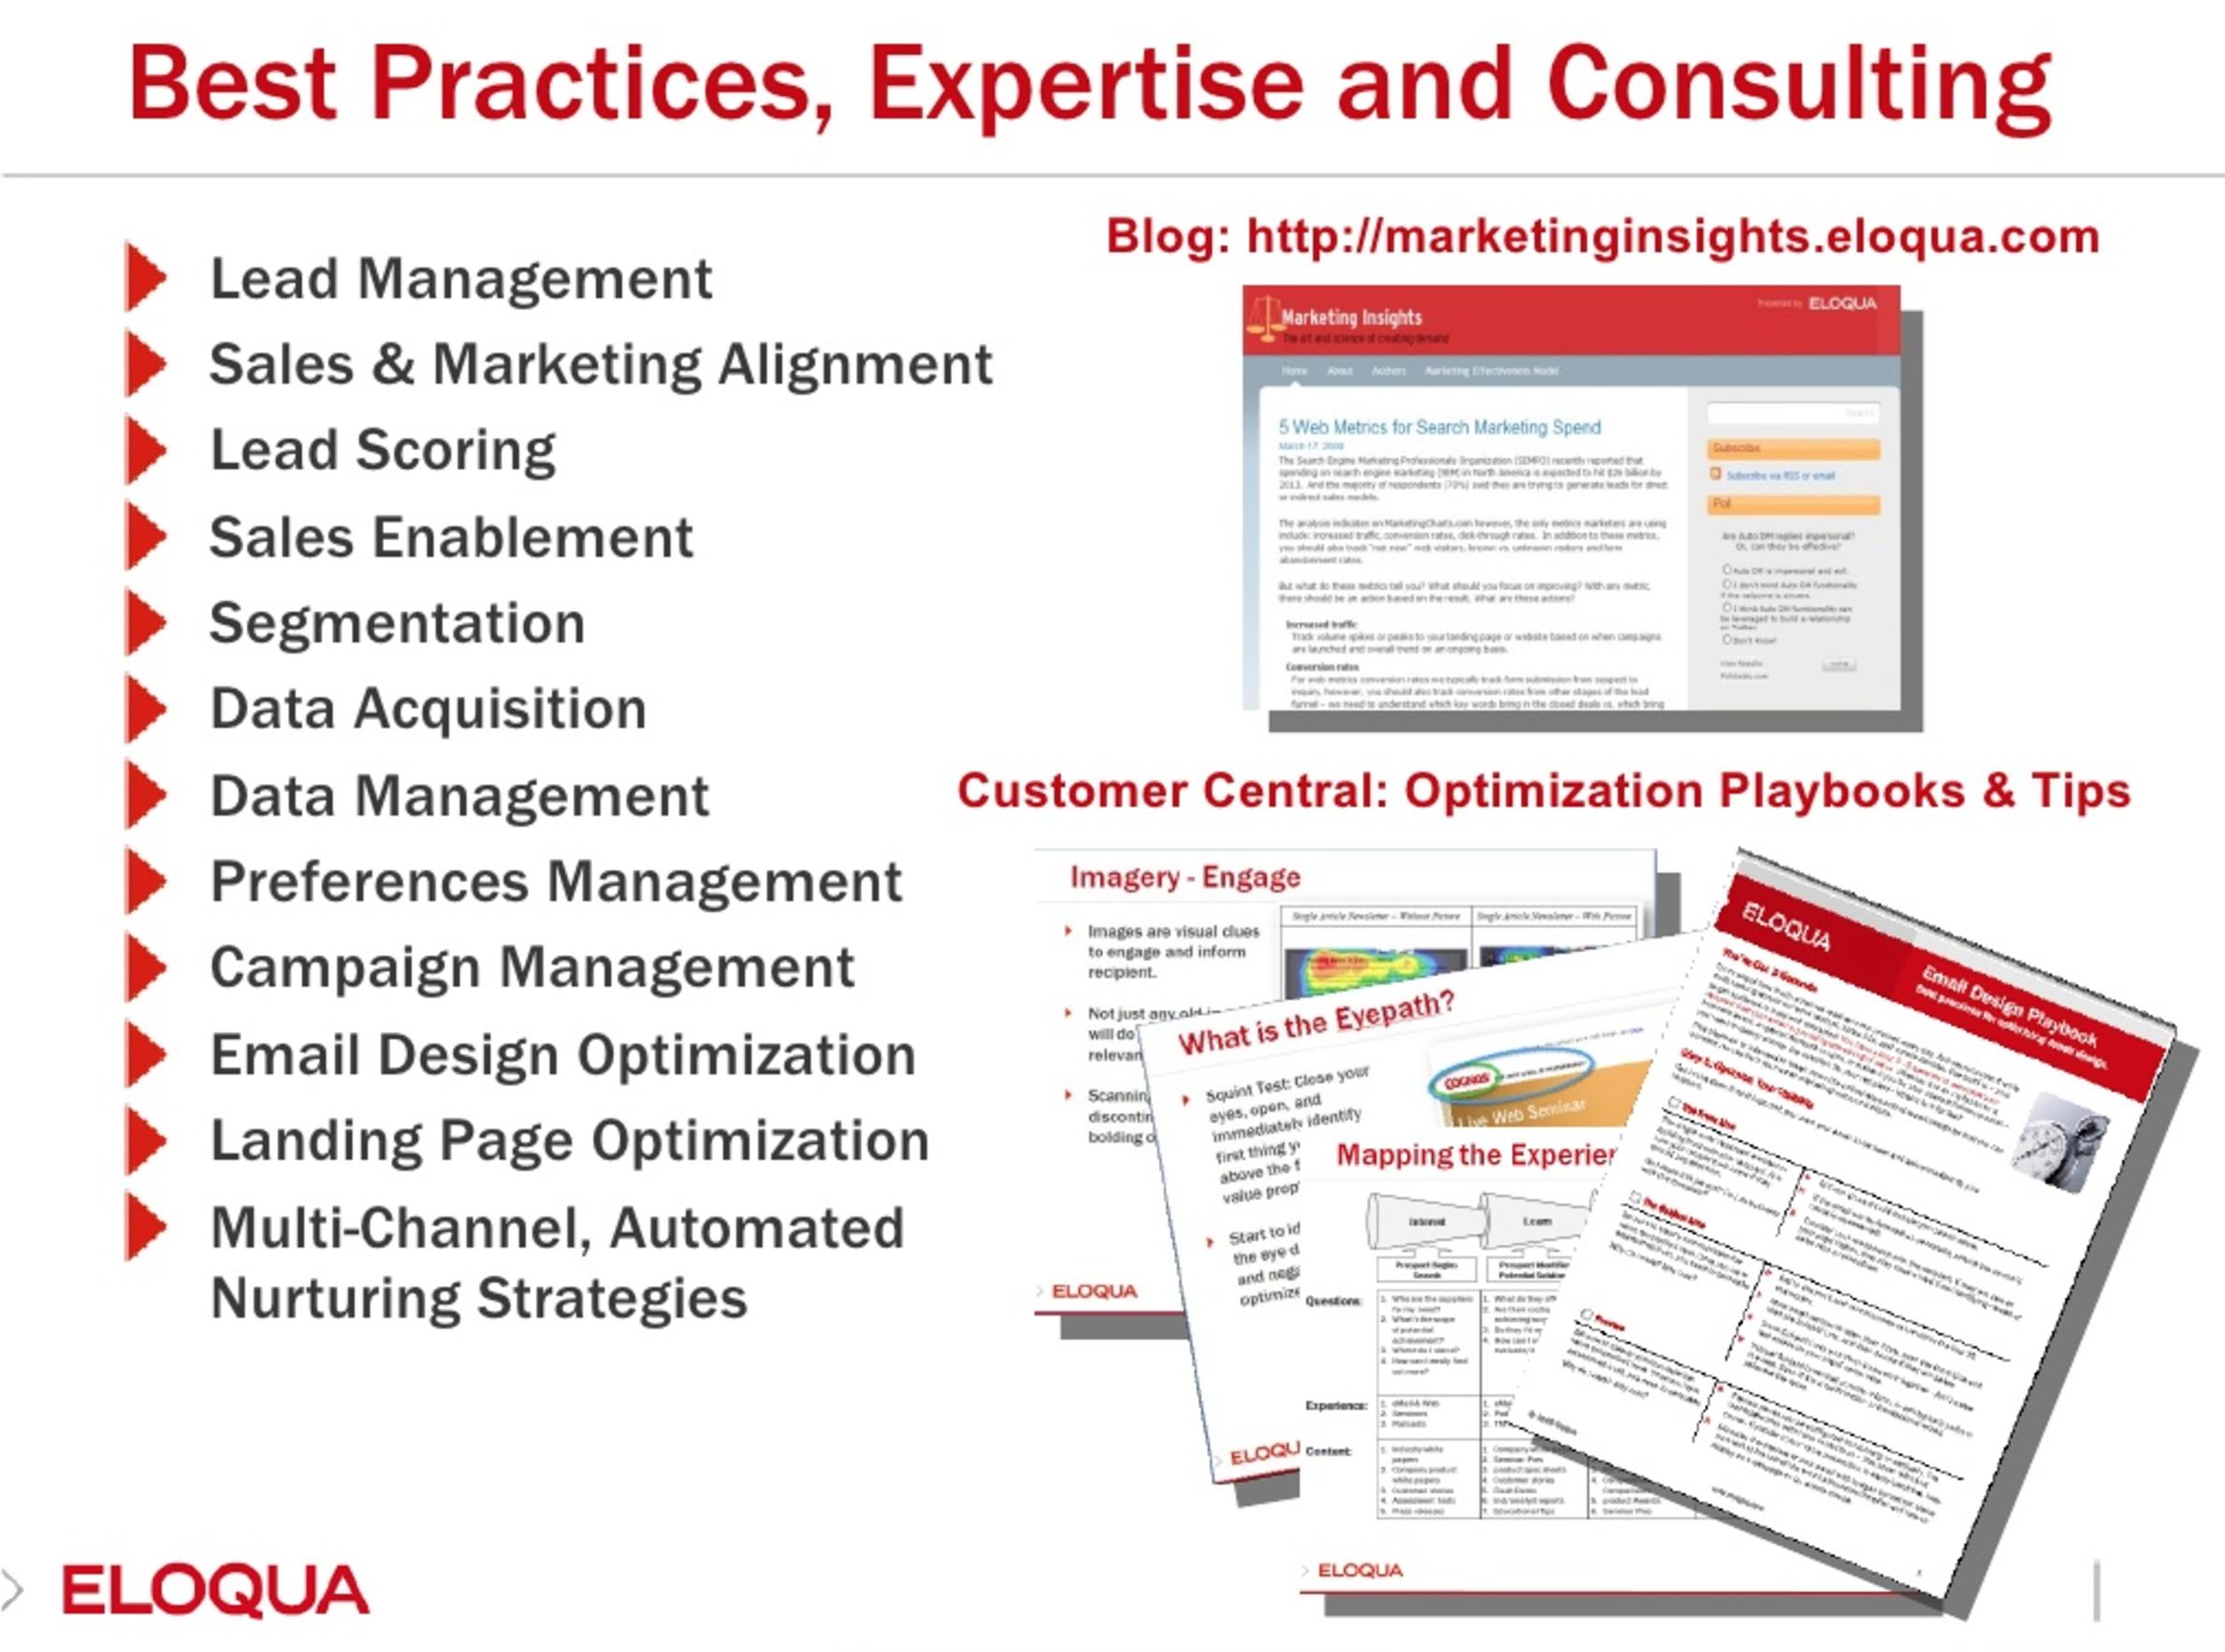 Presentation slide from Eloqua for enterprises